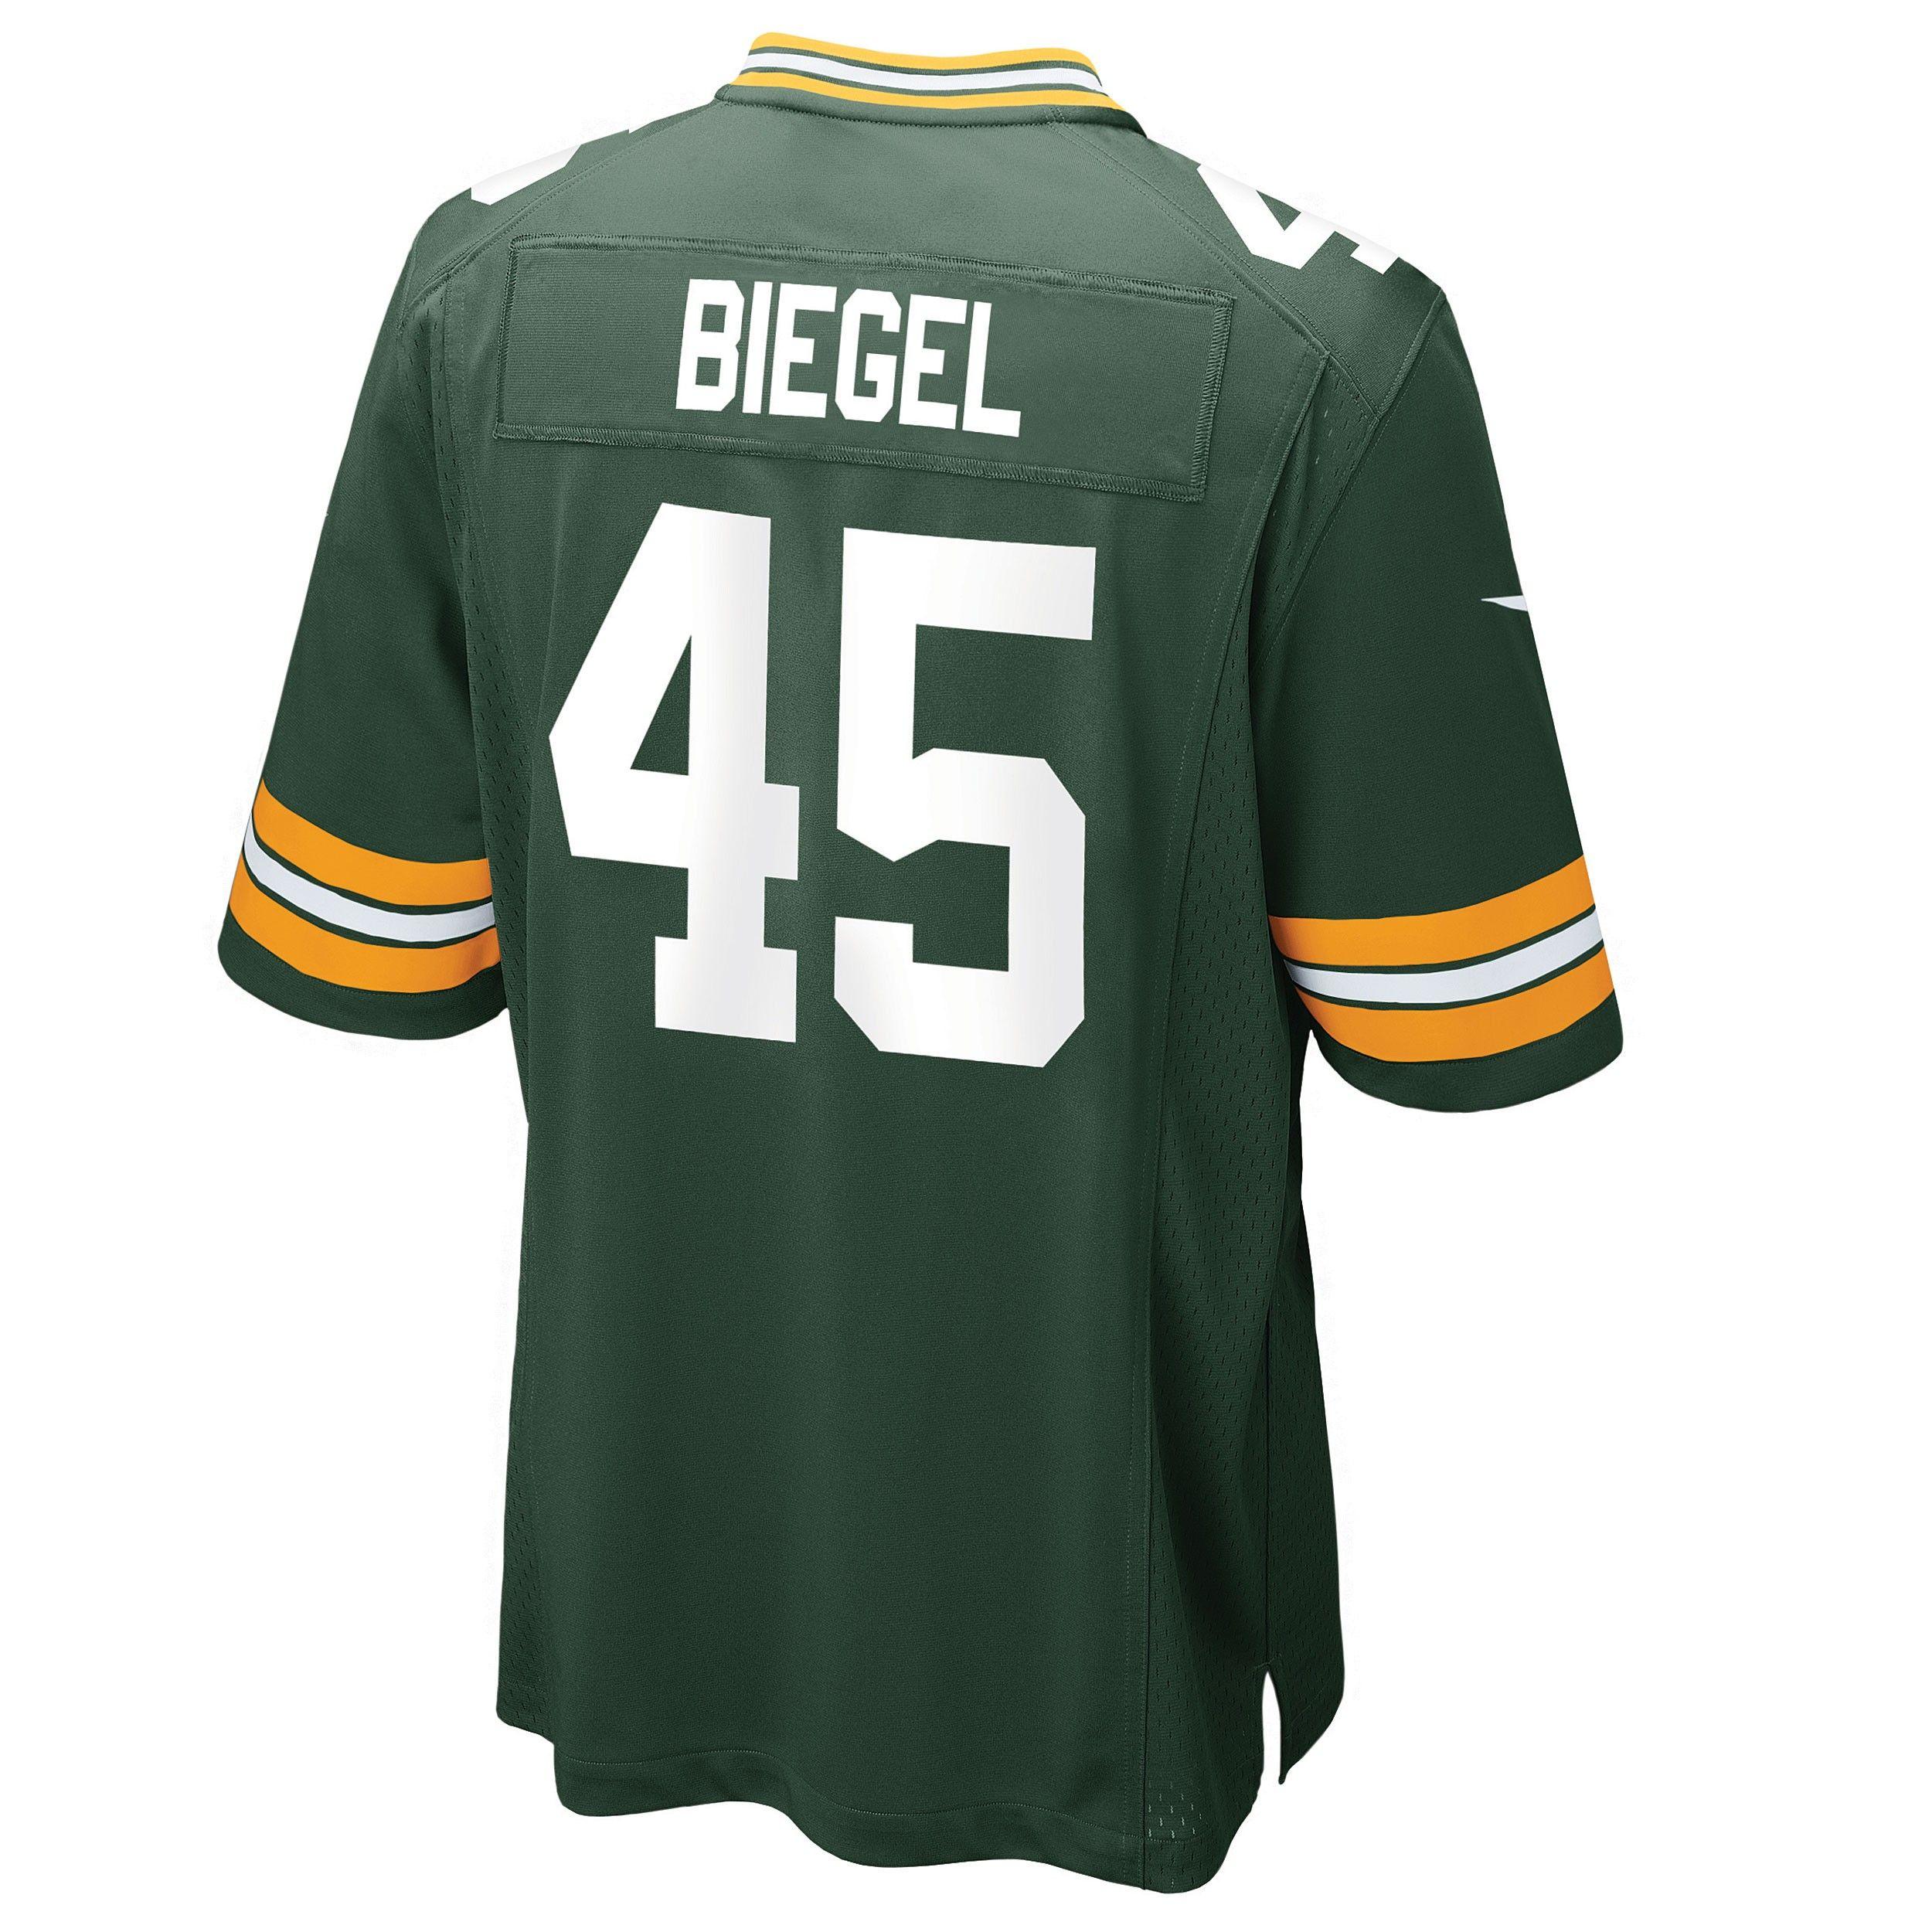 45 Vince Biegel Home Game Jersey Green Bay Packers Green Bay Packers Jerseys Packers Pro Shop